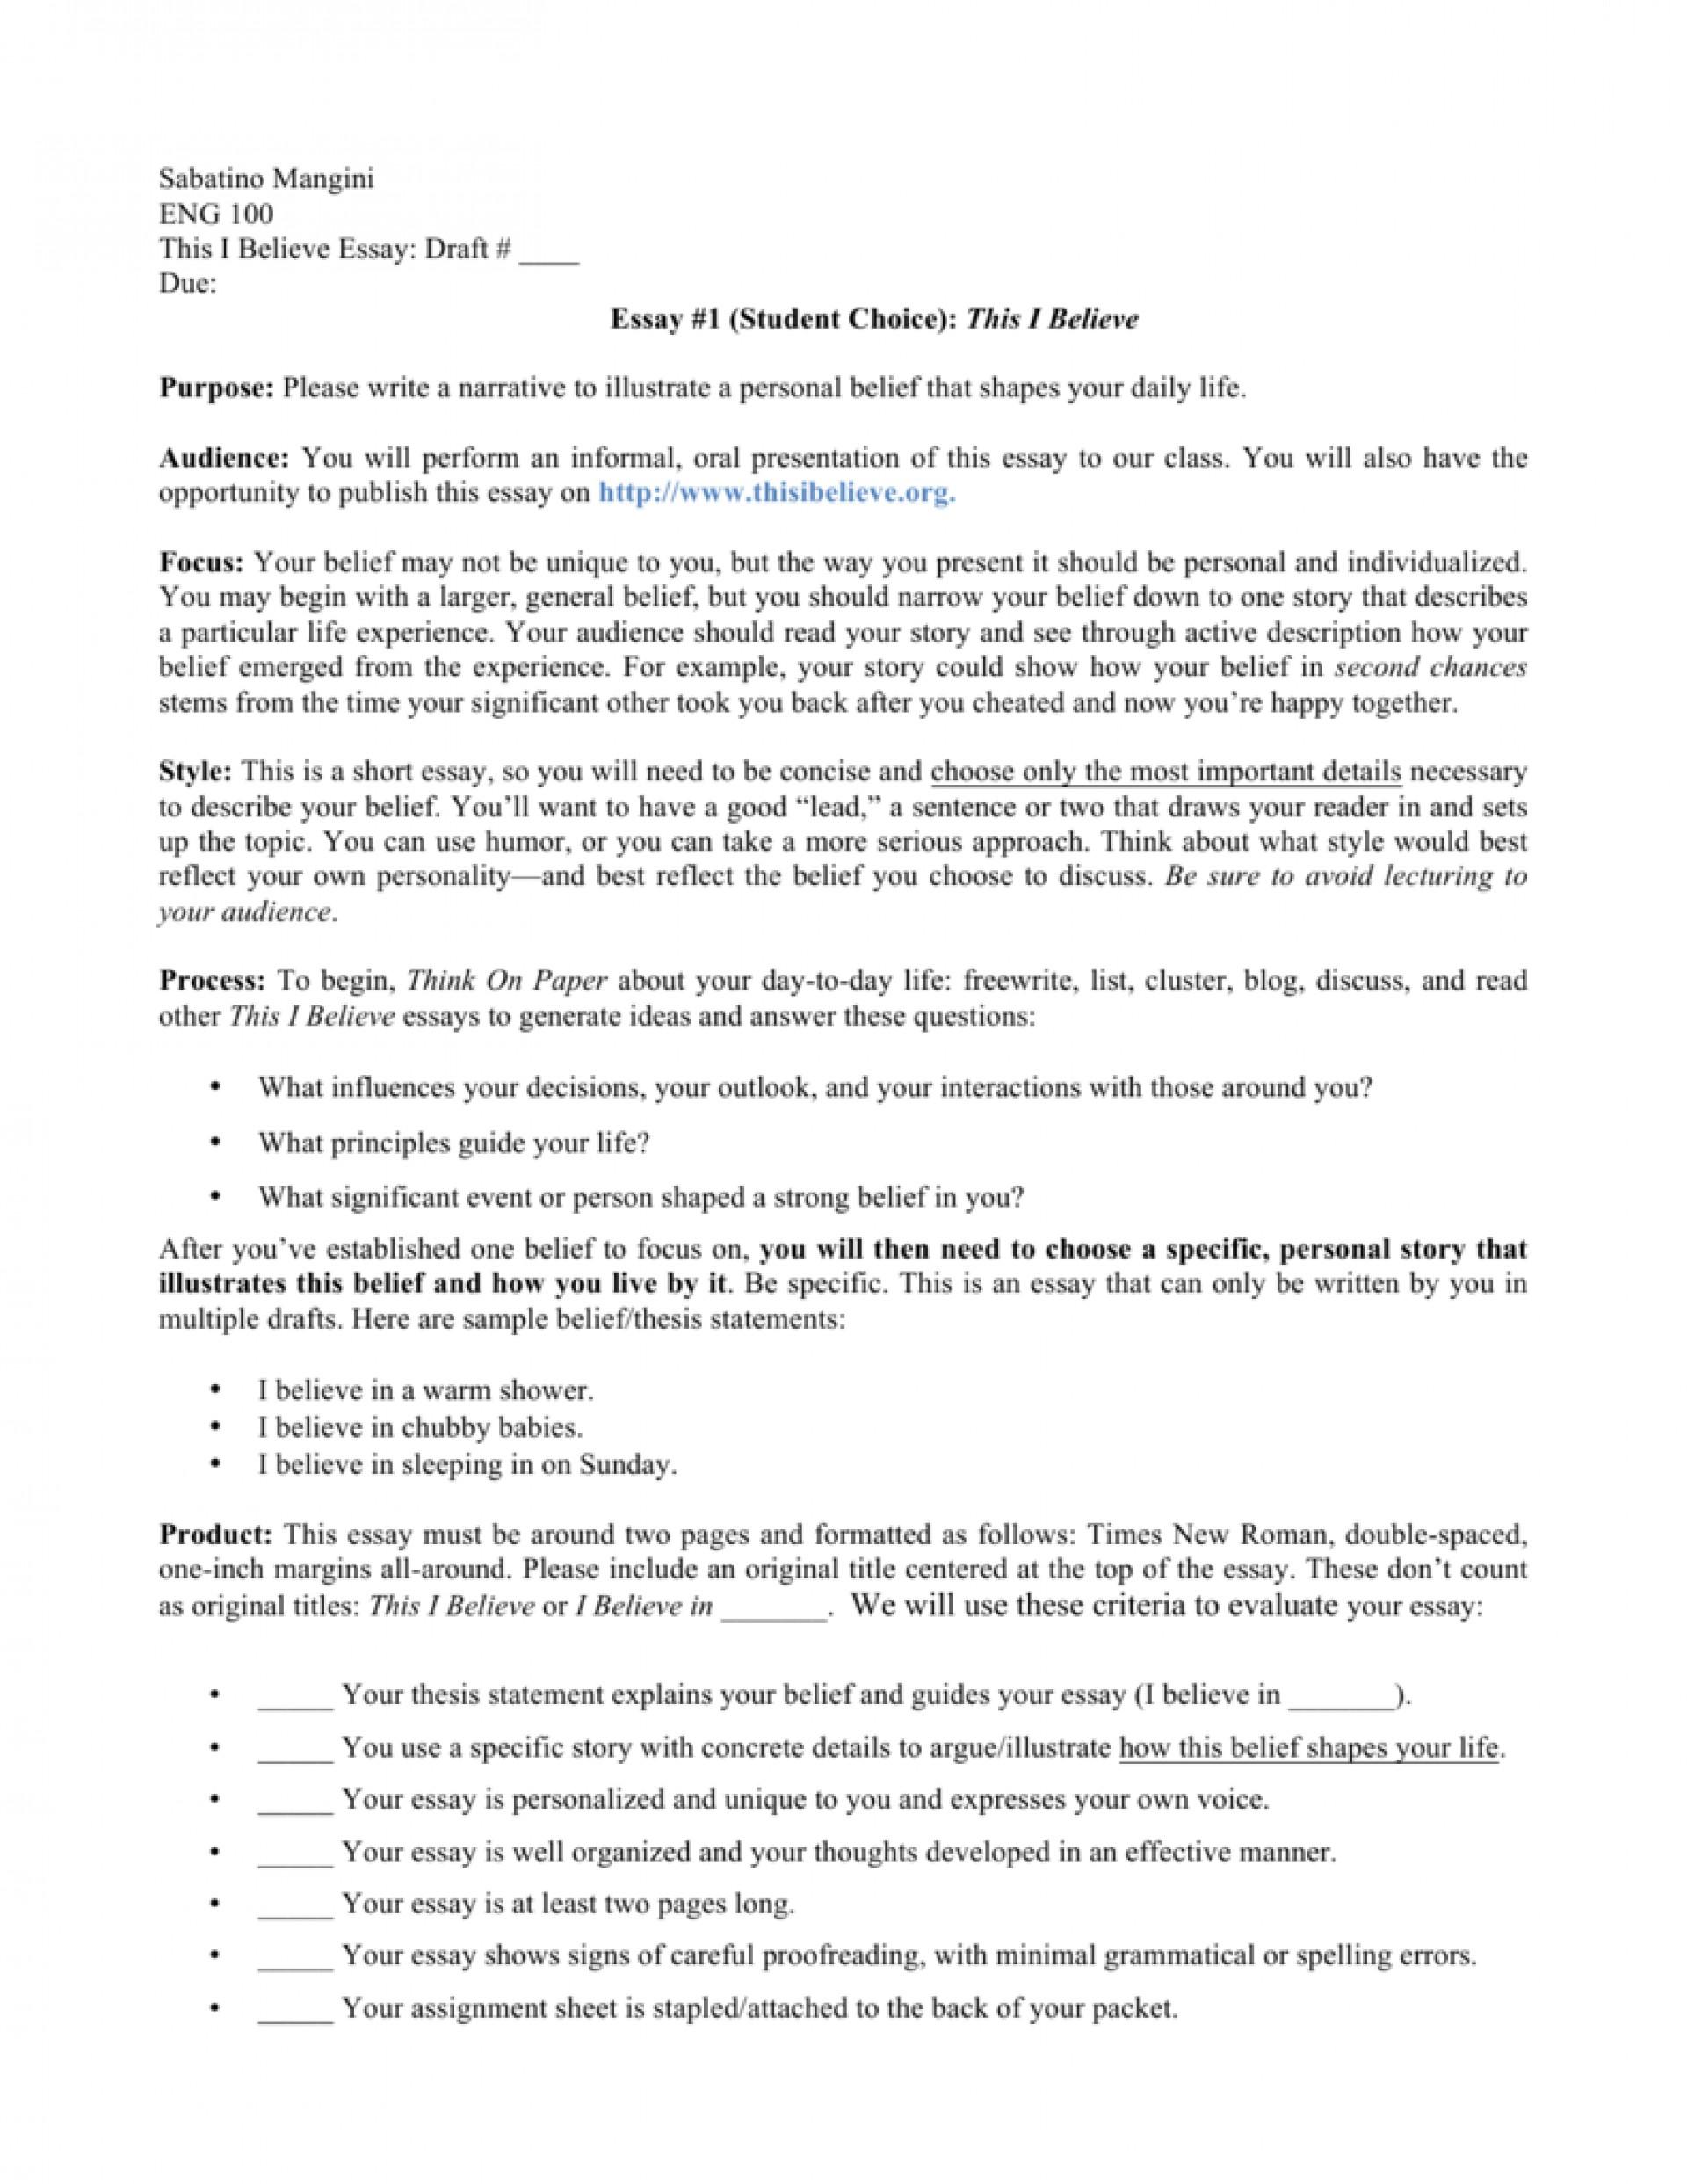 007 008807227 1 I Belive Essays Essay Surprising Believe About Sports Ideas 1920